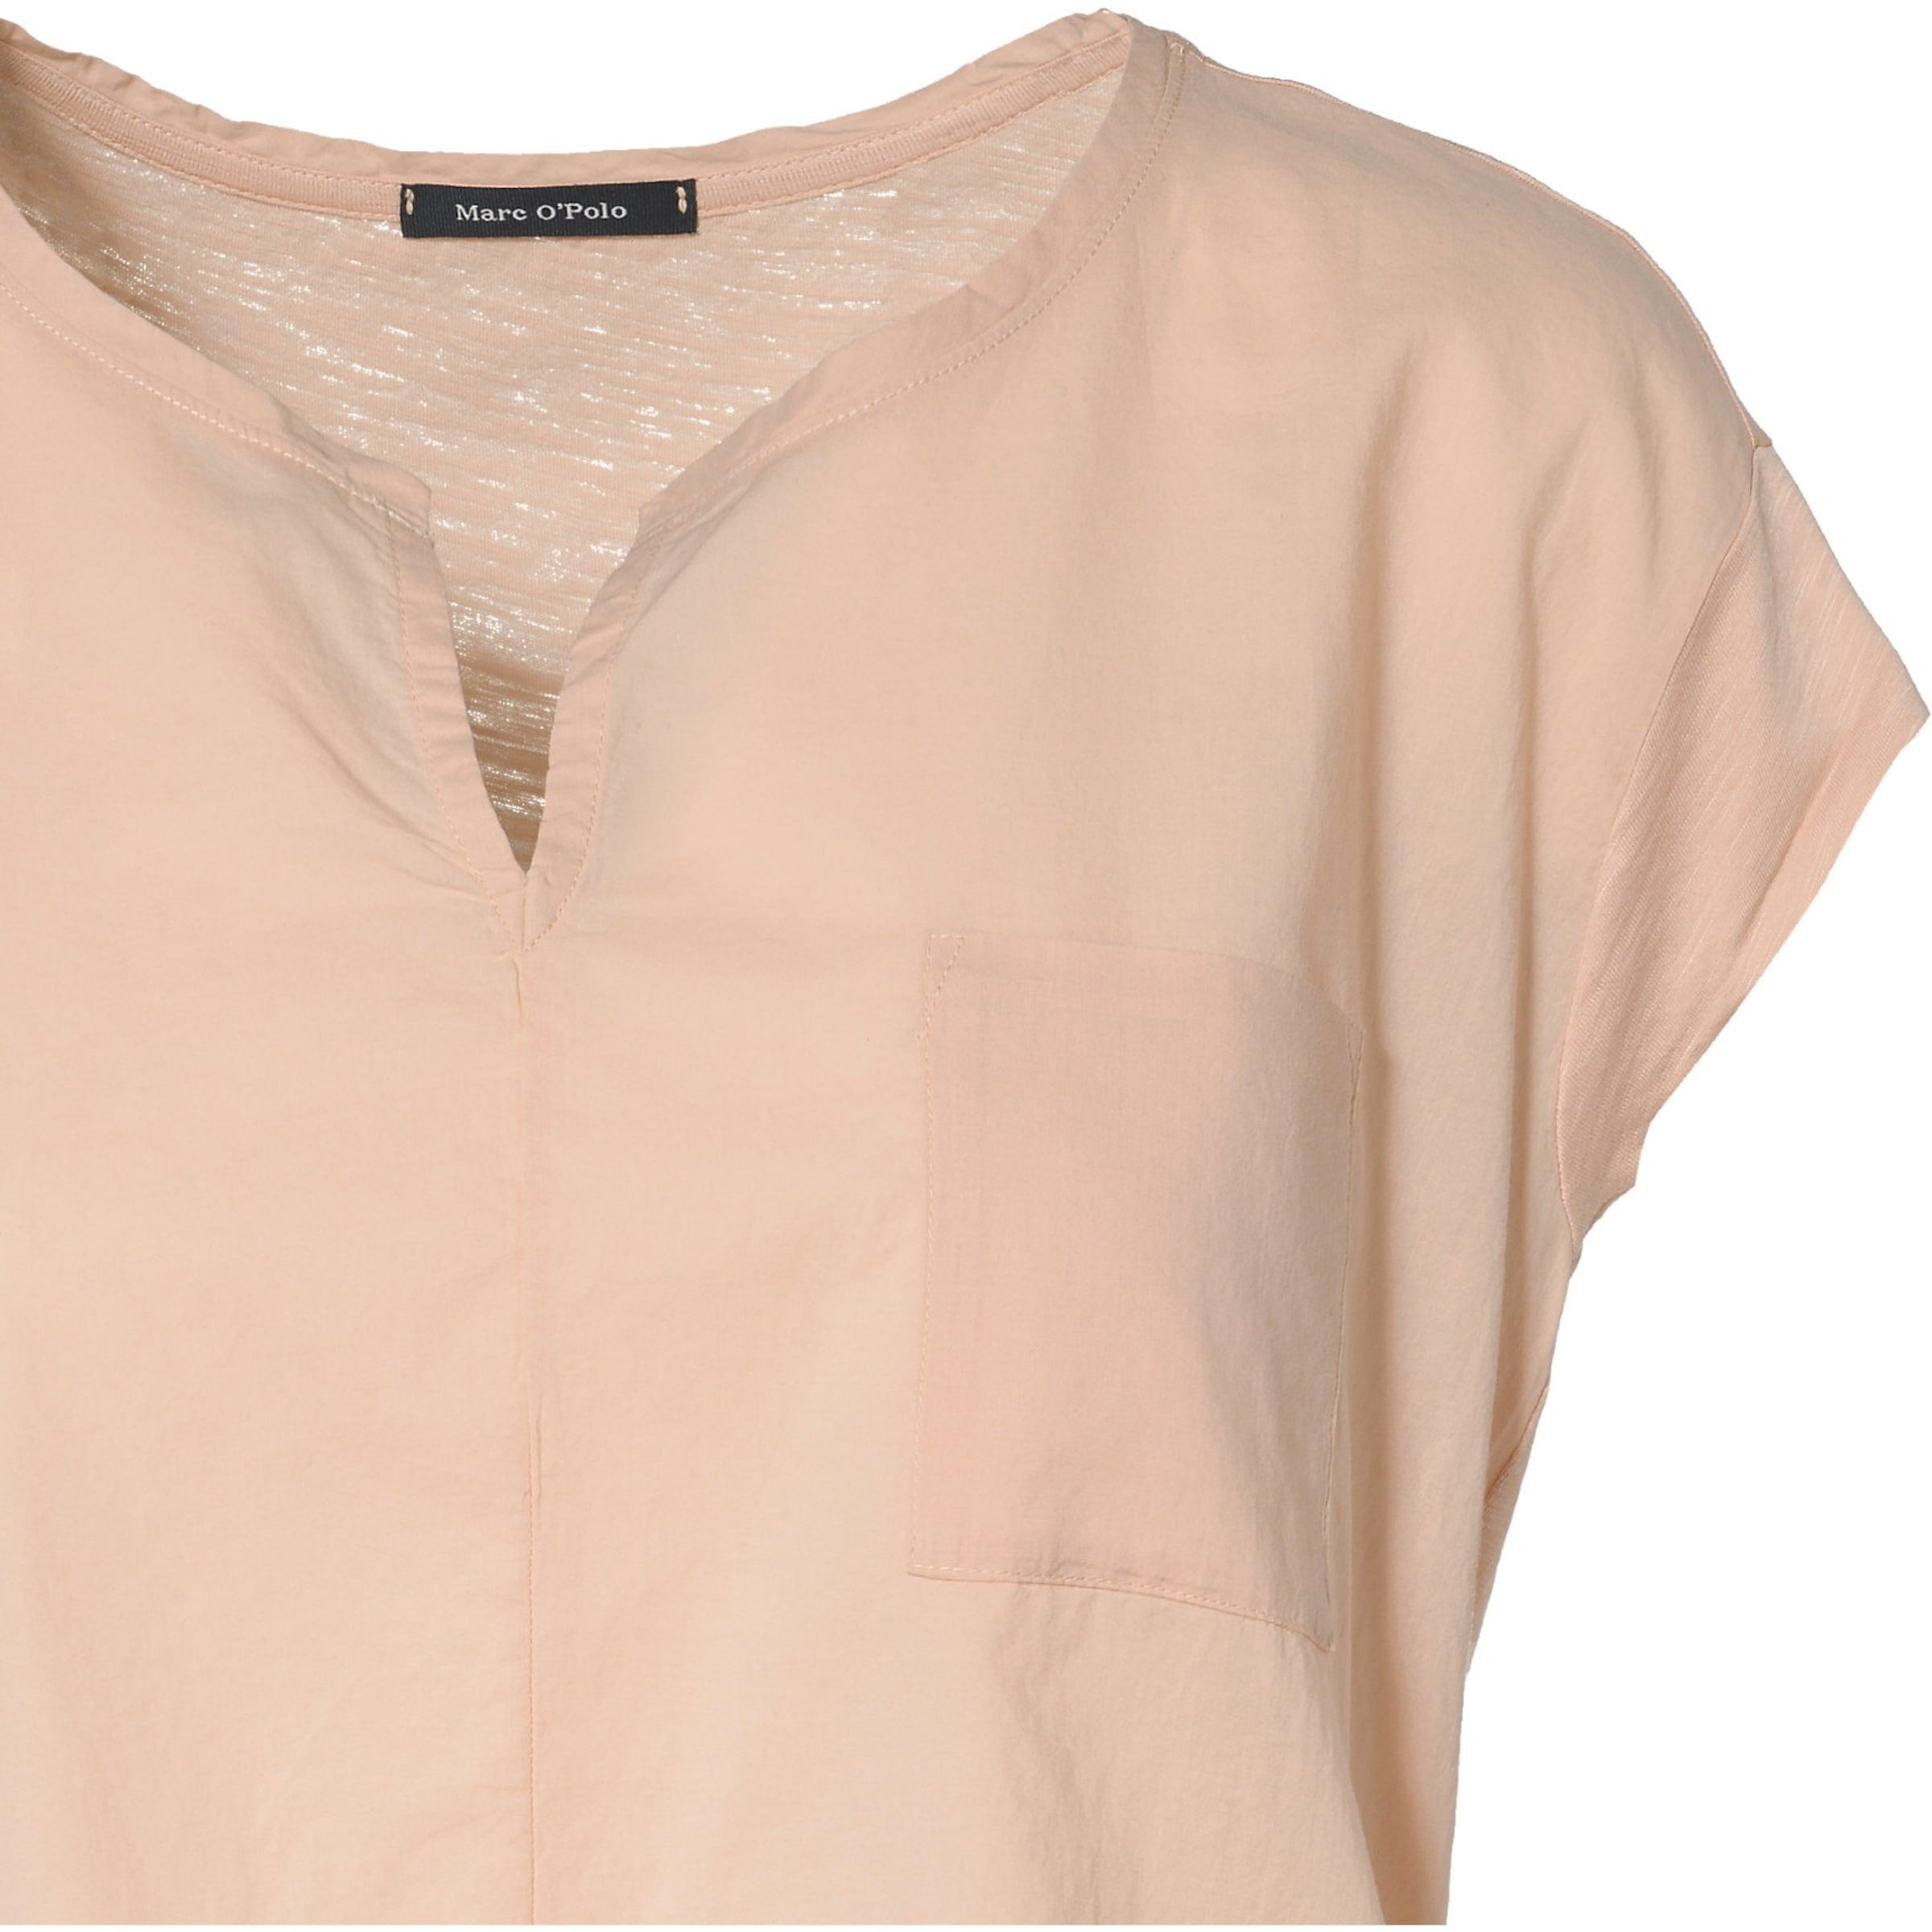 Günstig Kaufen Bequem Marc O'Polo T-Shirt Billige Amazon RVmCc4hrjH